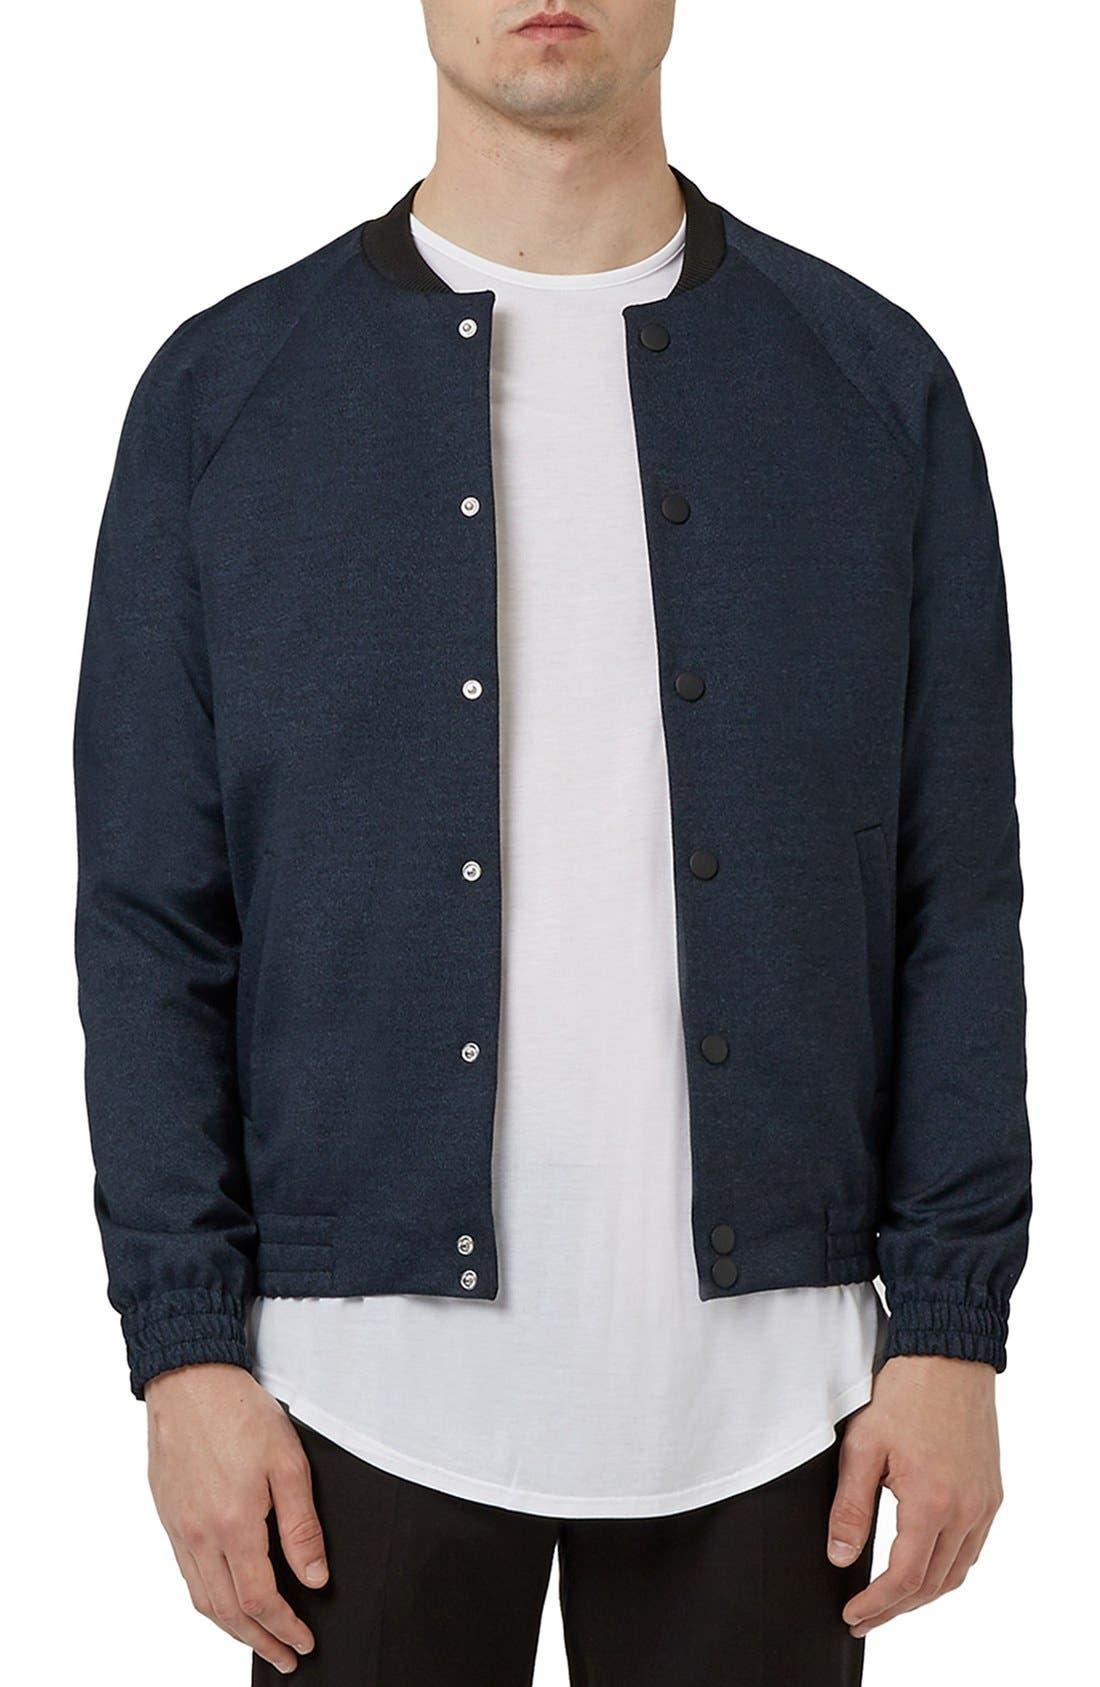 TOPMAN,                             Tailored Fit Raglan Bomber Jacket,                             Main thumbnail 1, color,                             410